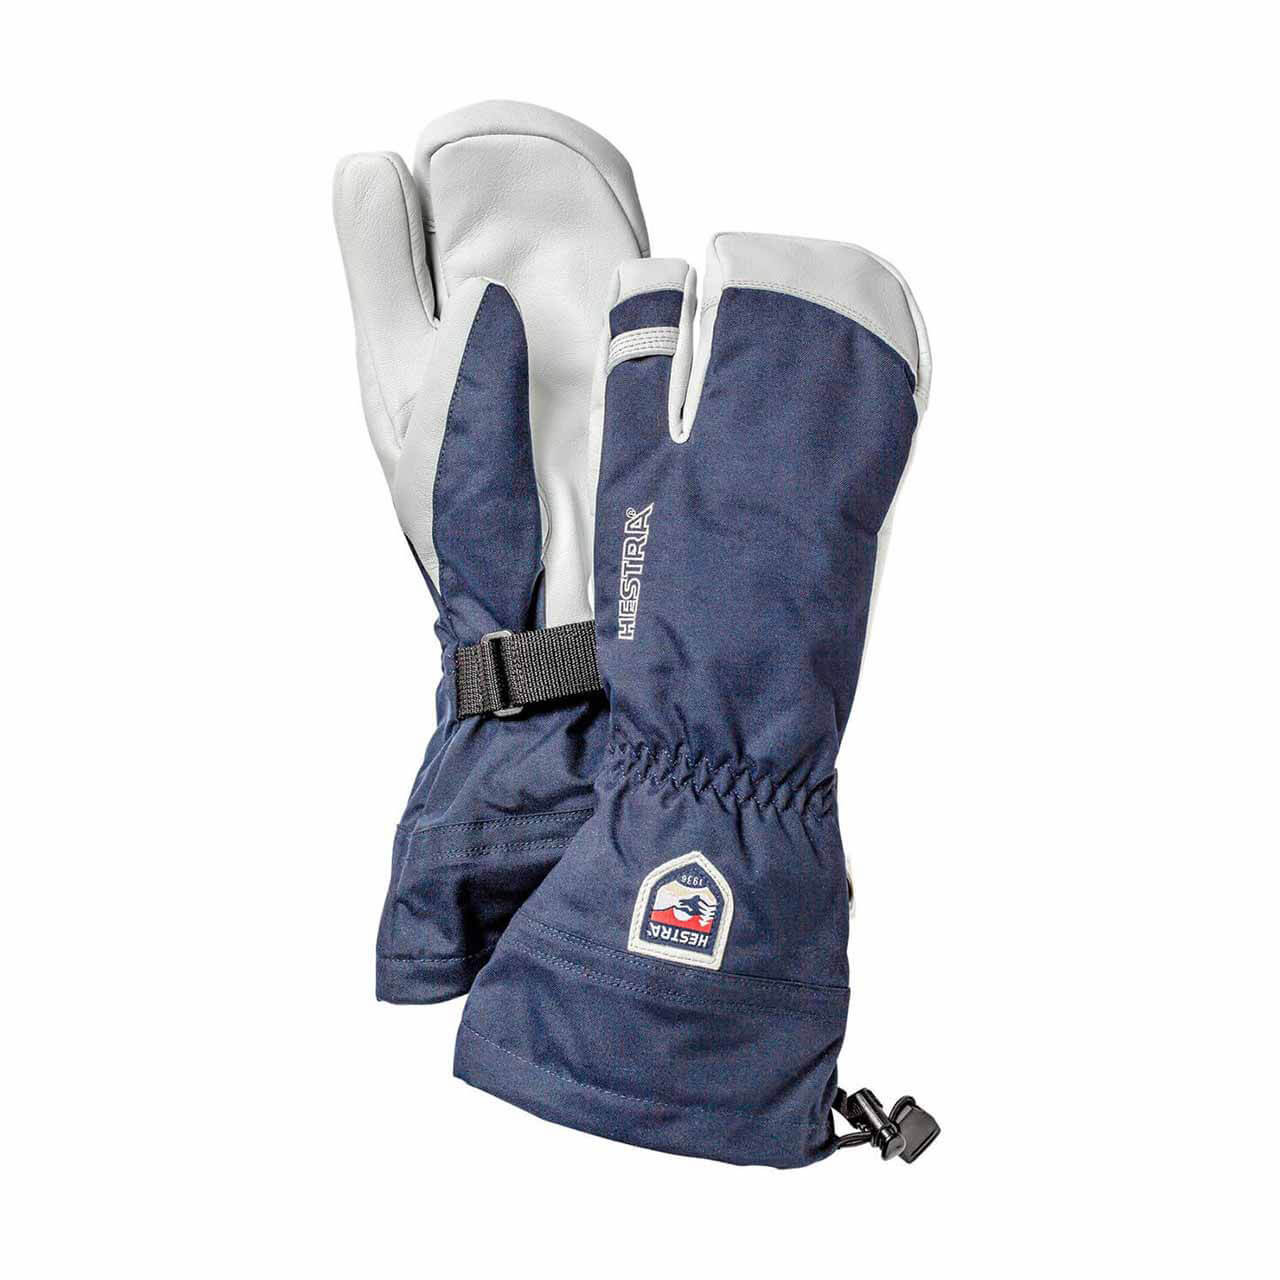 Hestra Men S Heli Ski 3 Finger Glove Campman